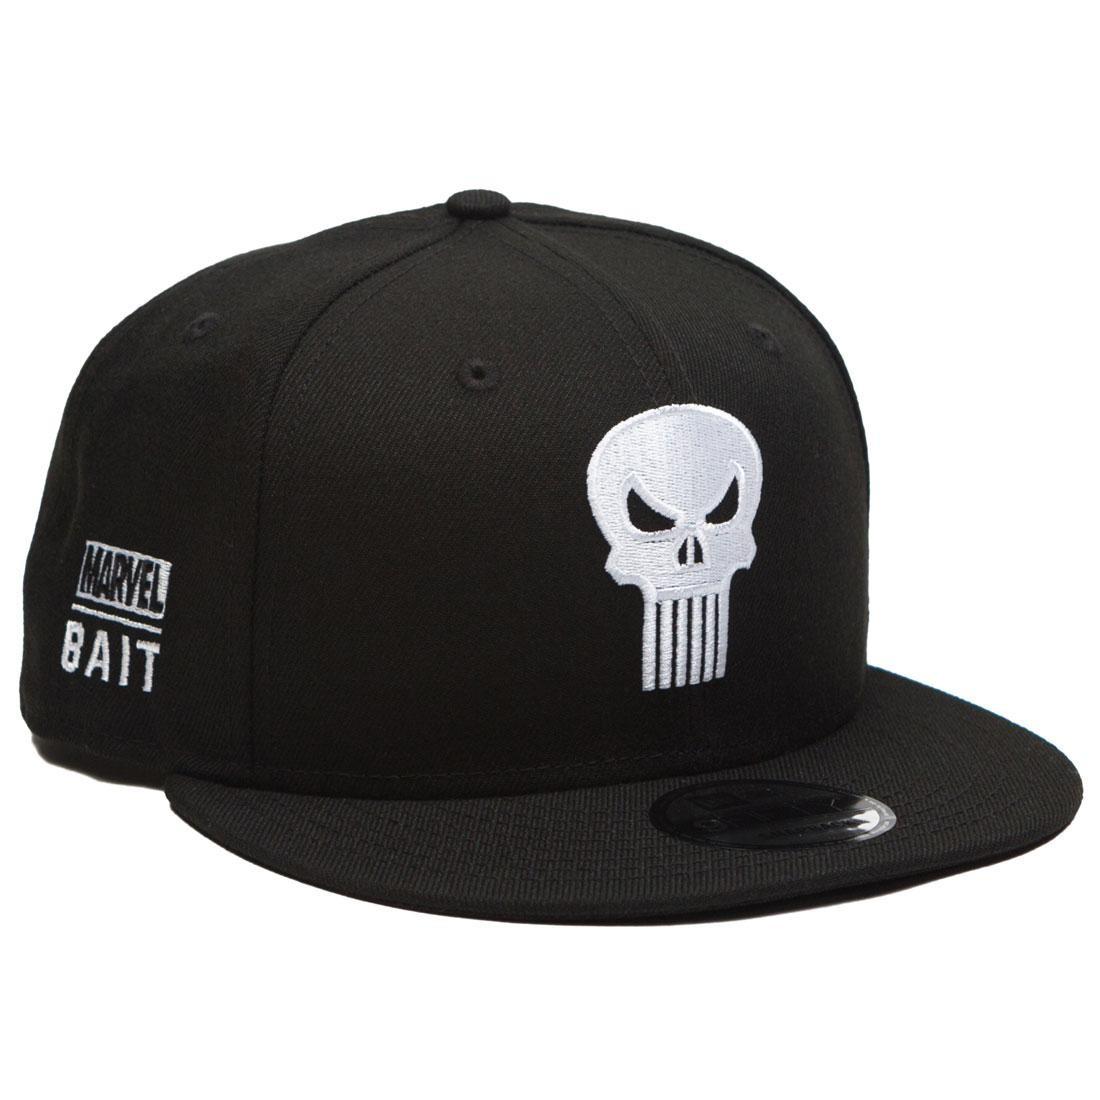 BAIT x Marvel x New Era 9Fifty Punisher Black Snapback Cap (black)